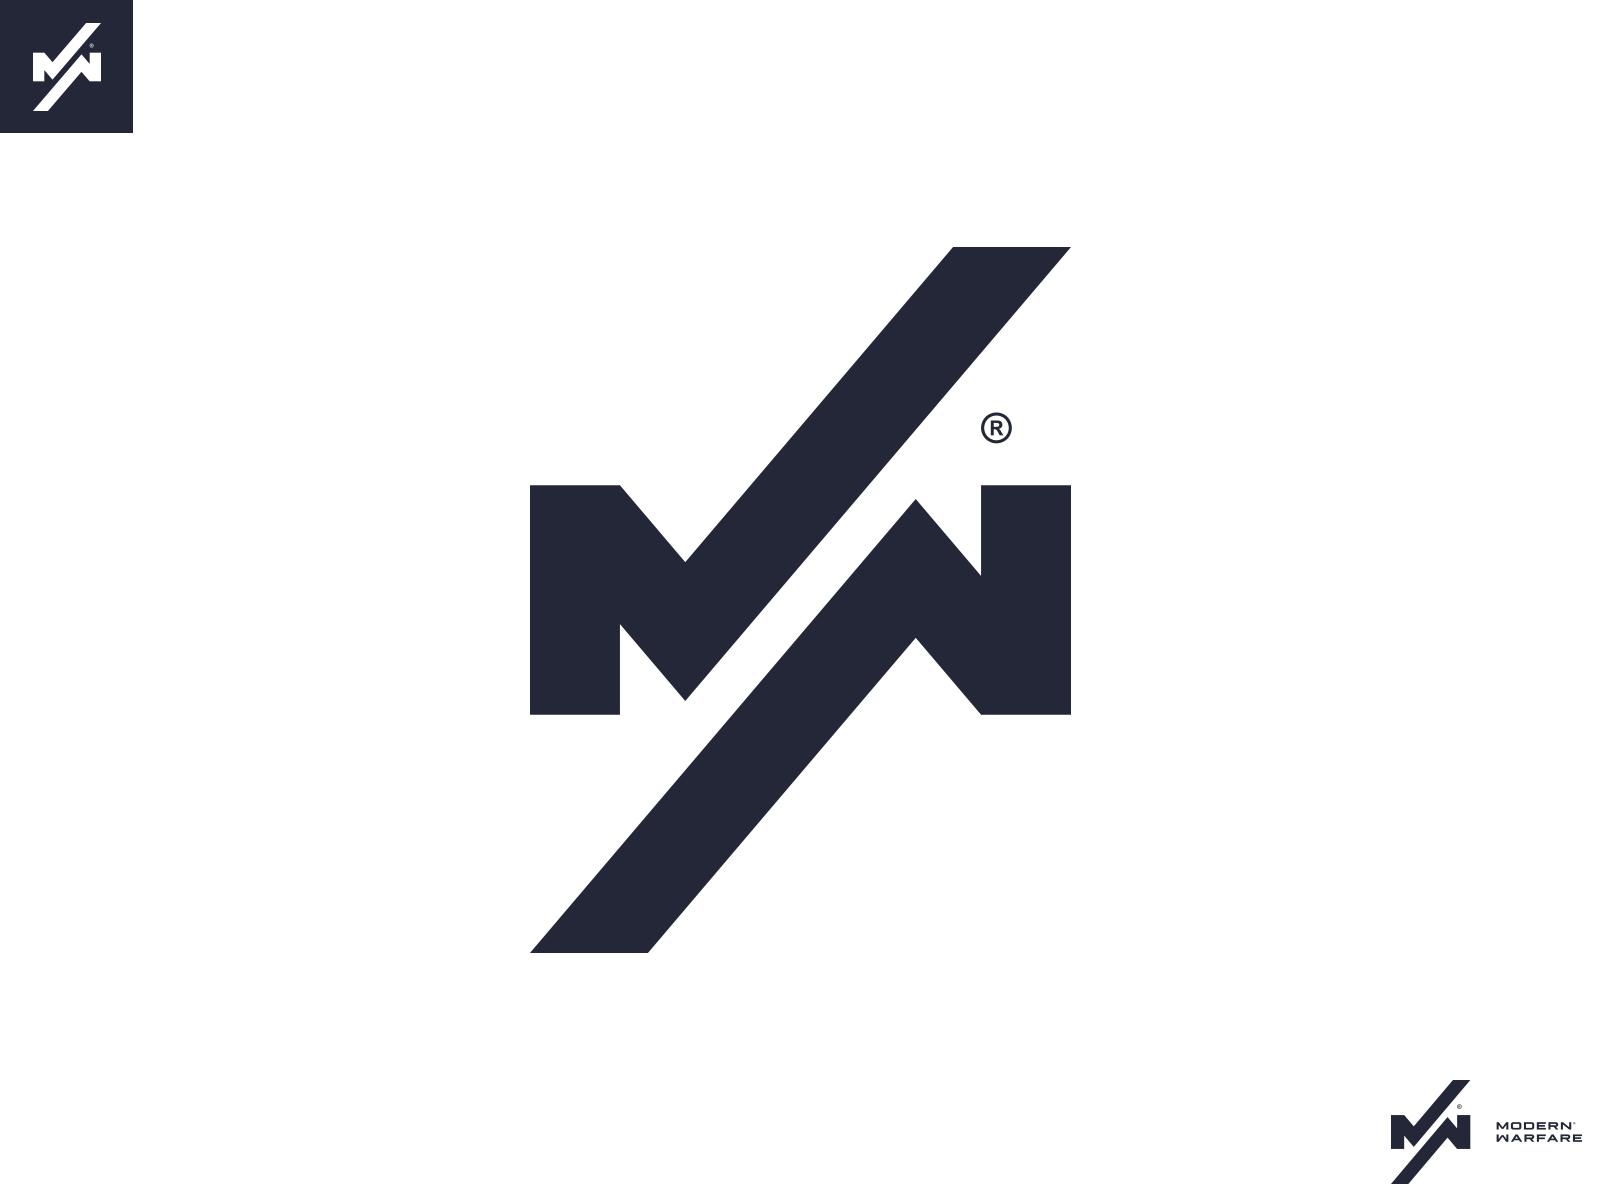 Call of Duty Modern Warfare Logo Concept by Jimper on Dribbble 1600x1200